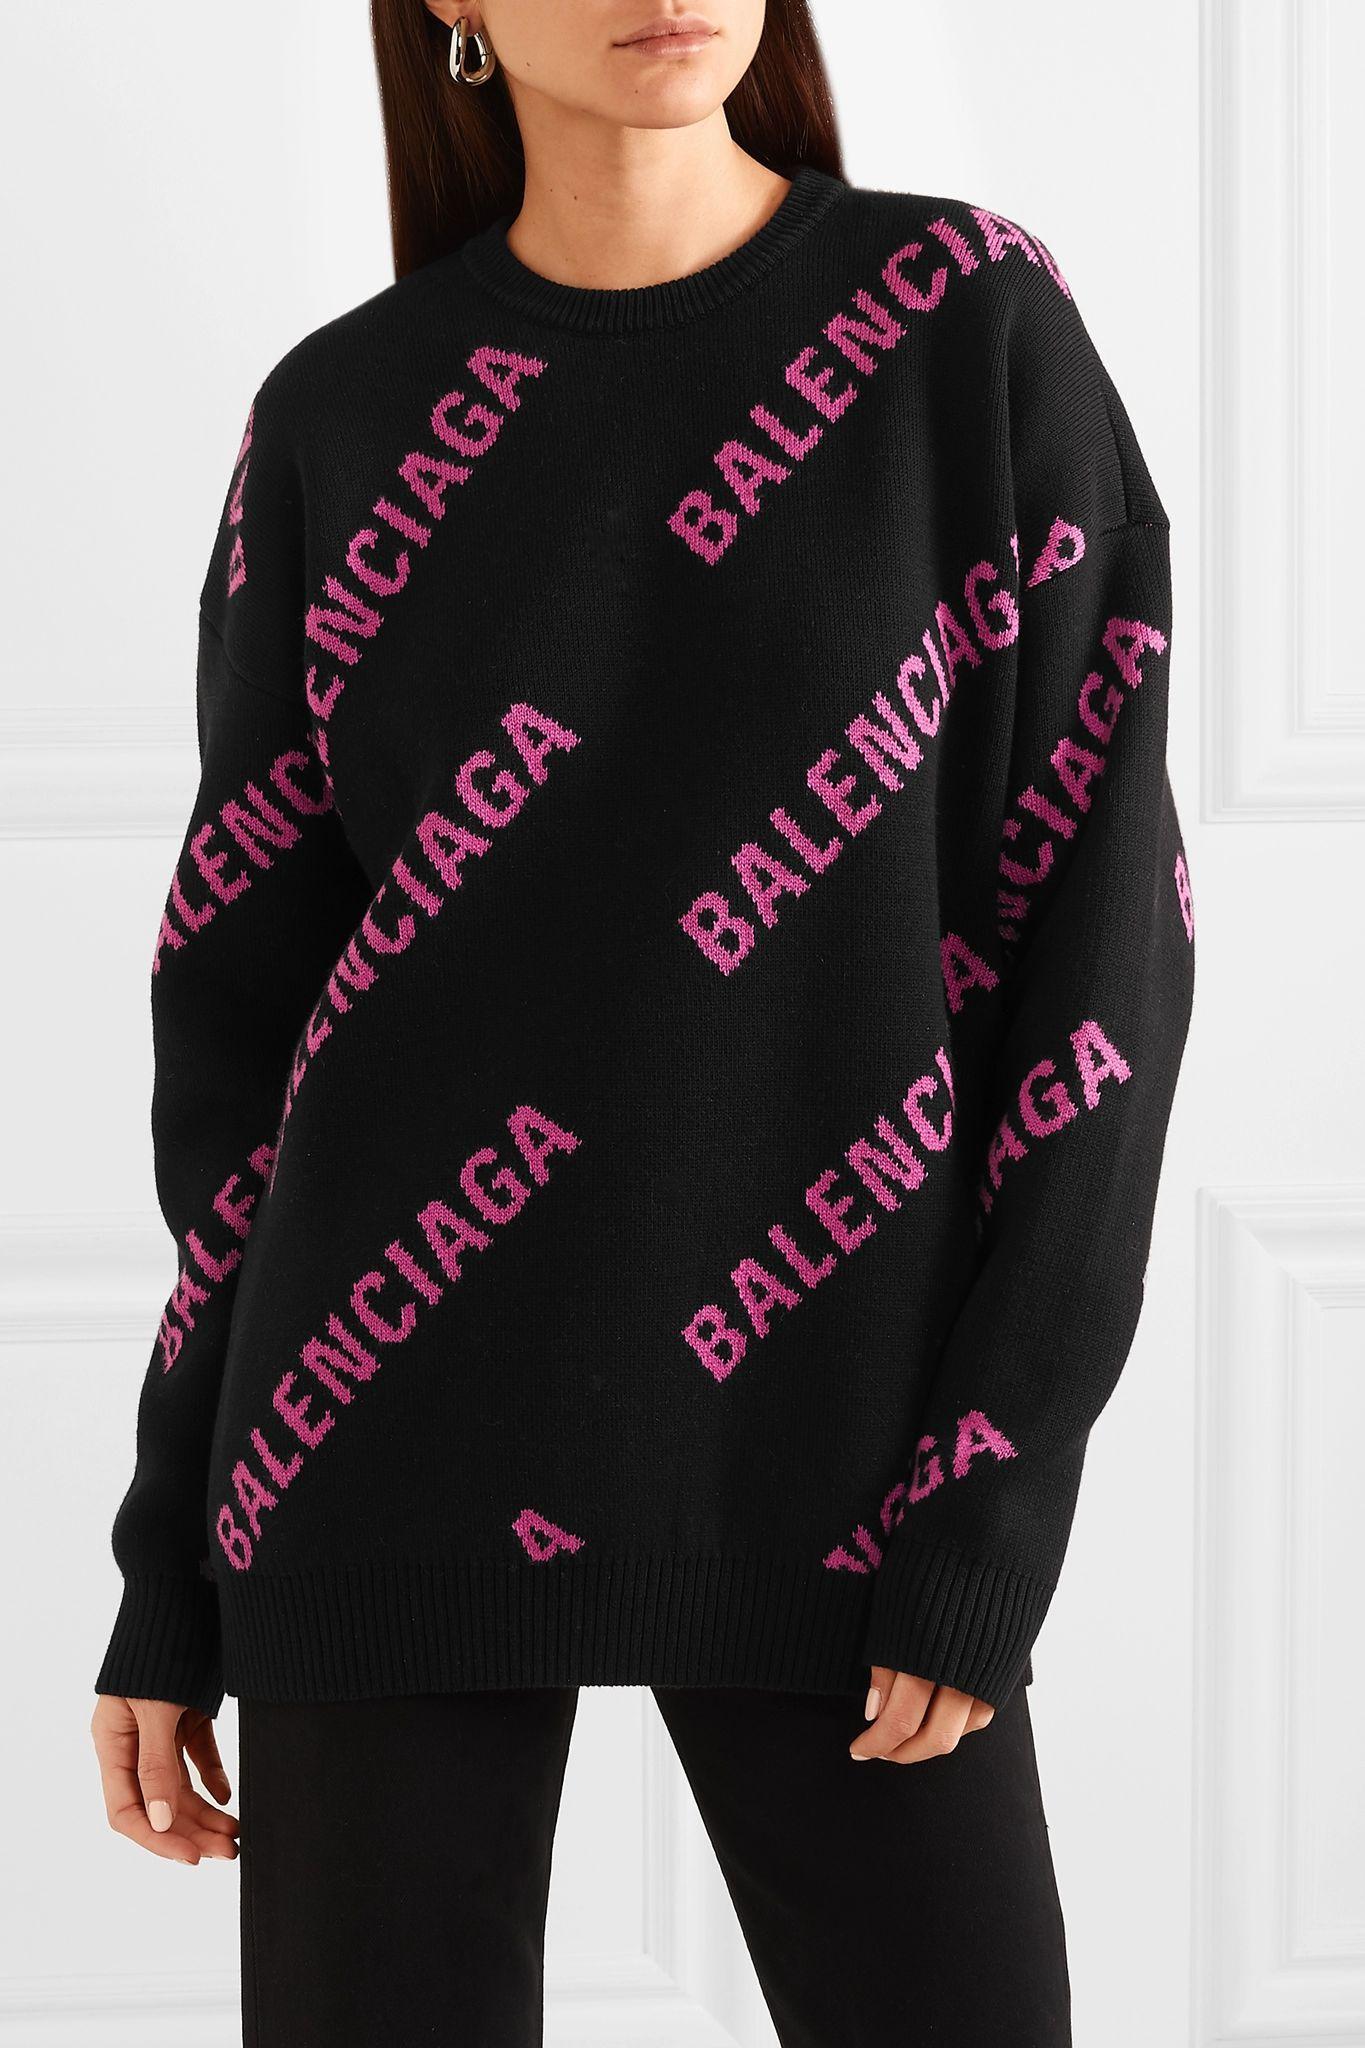 Black Oversized Intarsia Cotton Blend Sweater Balenciaga Net A Porter Sweaters Balenciaga Clothing Fashion Drawing Dresses [ 2048 x 1365 Pixel ]